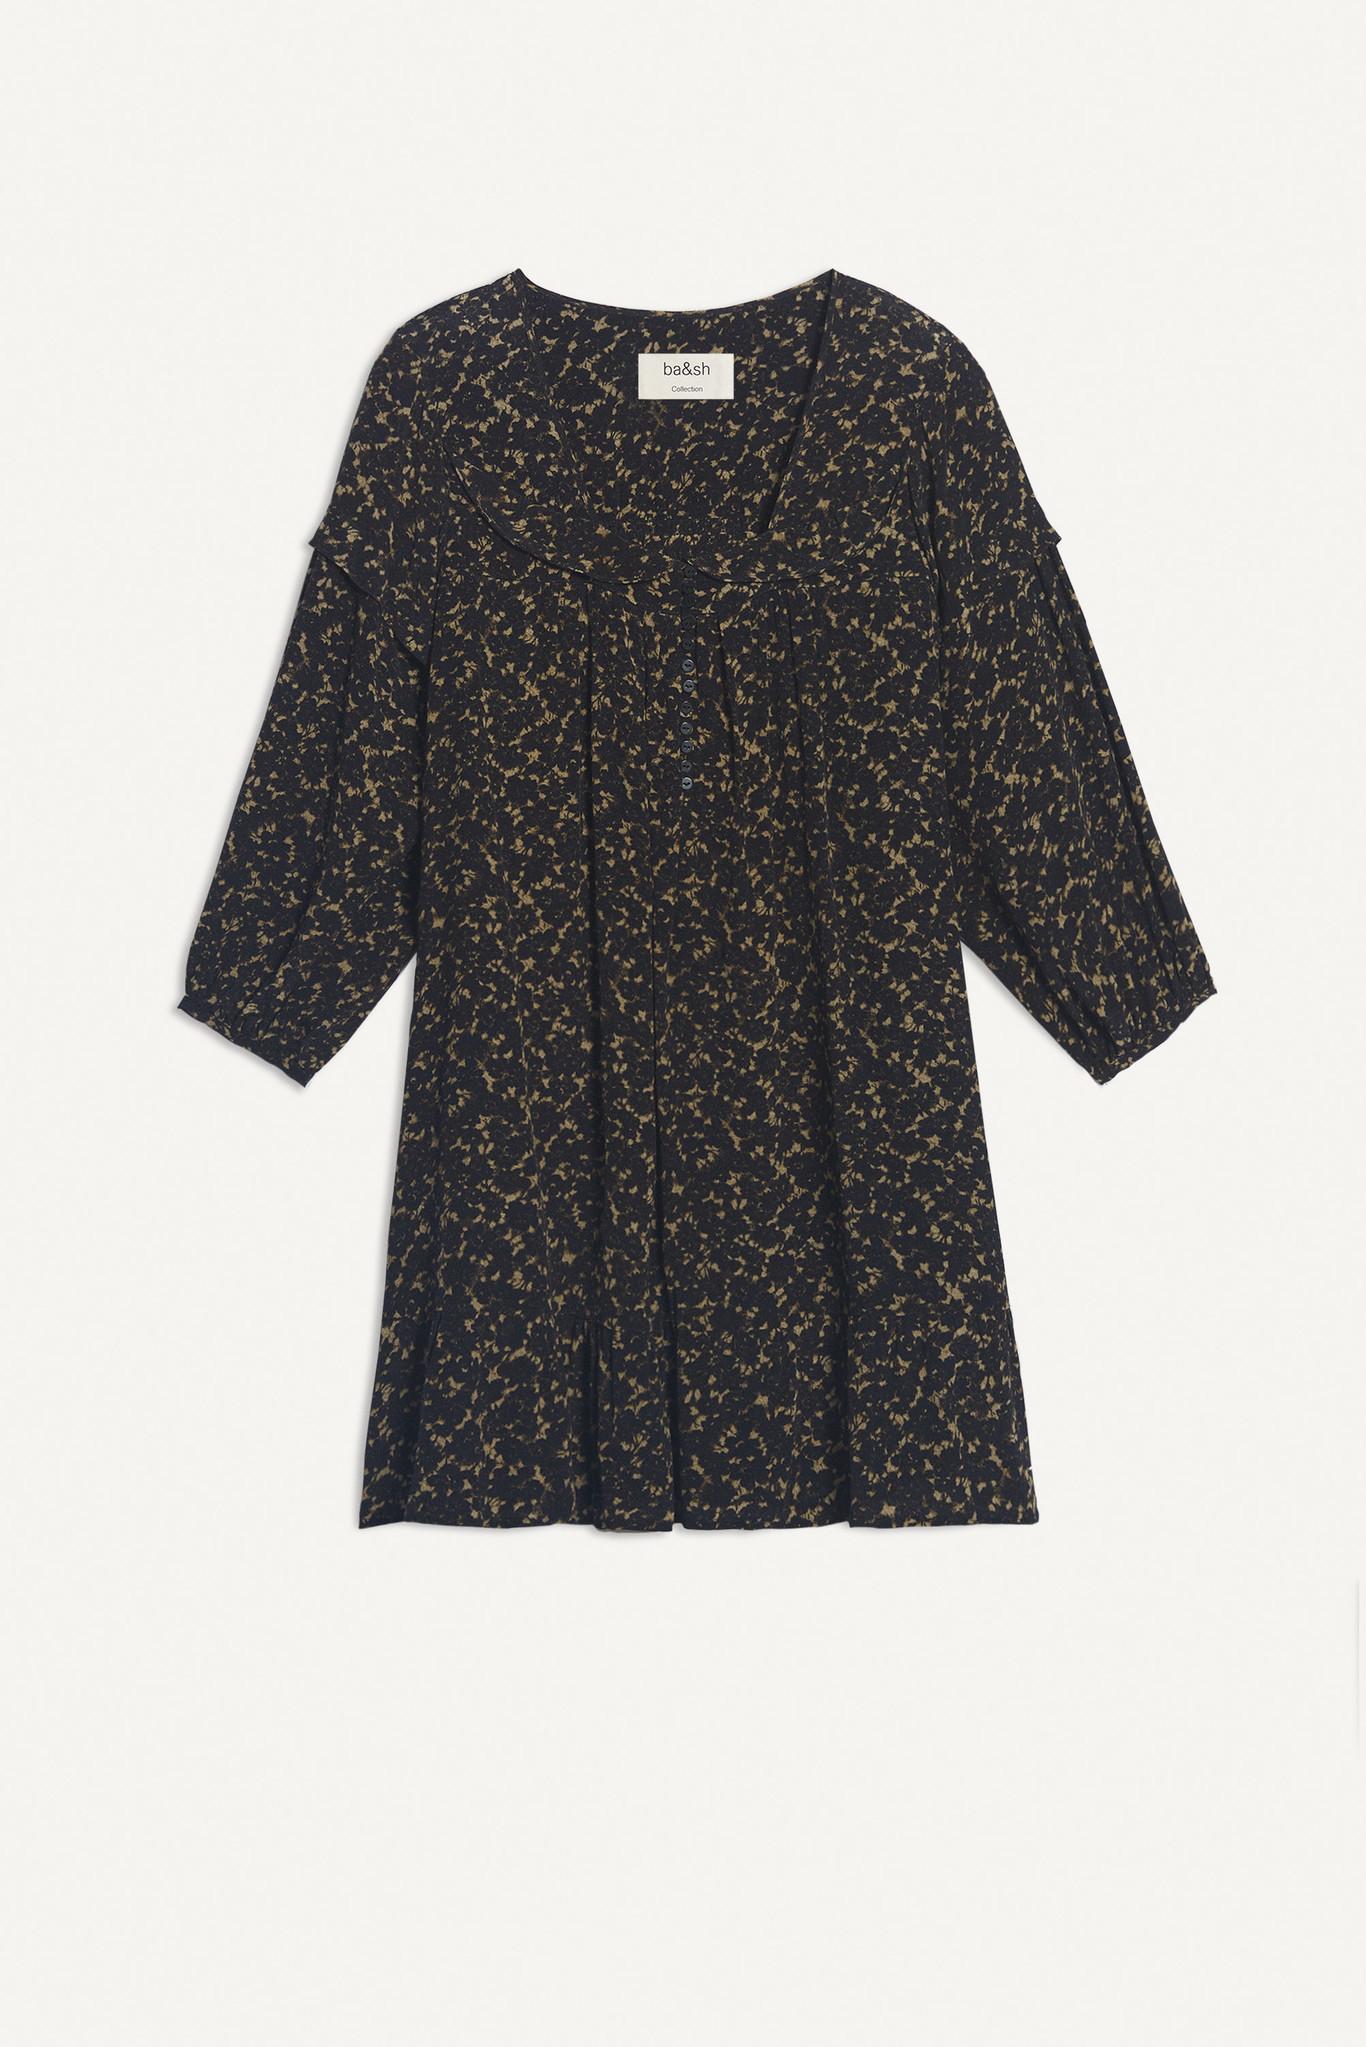 BA&SH robe elroy-1